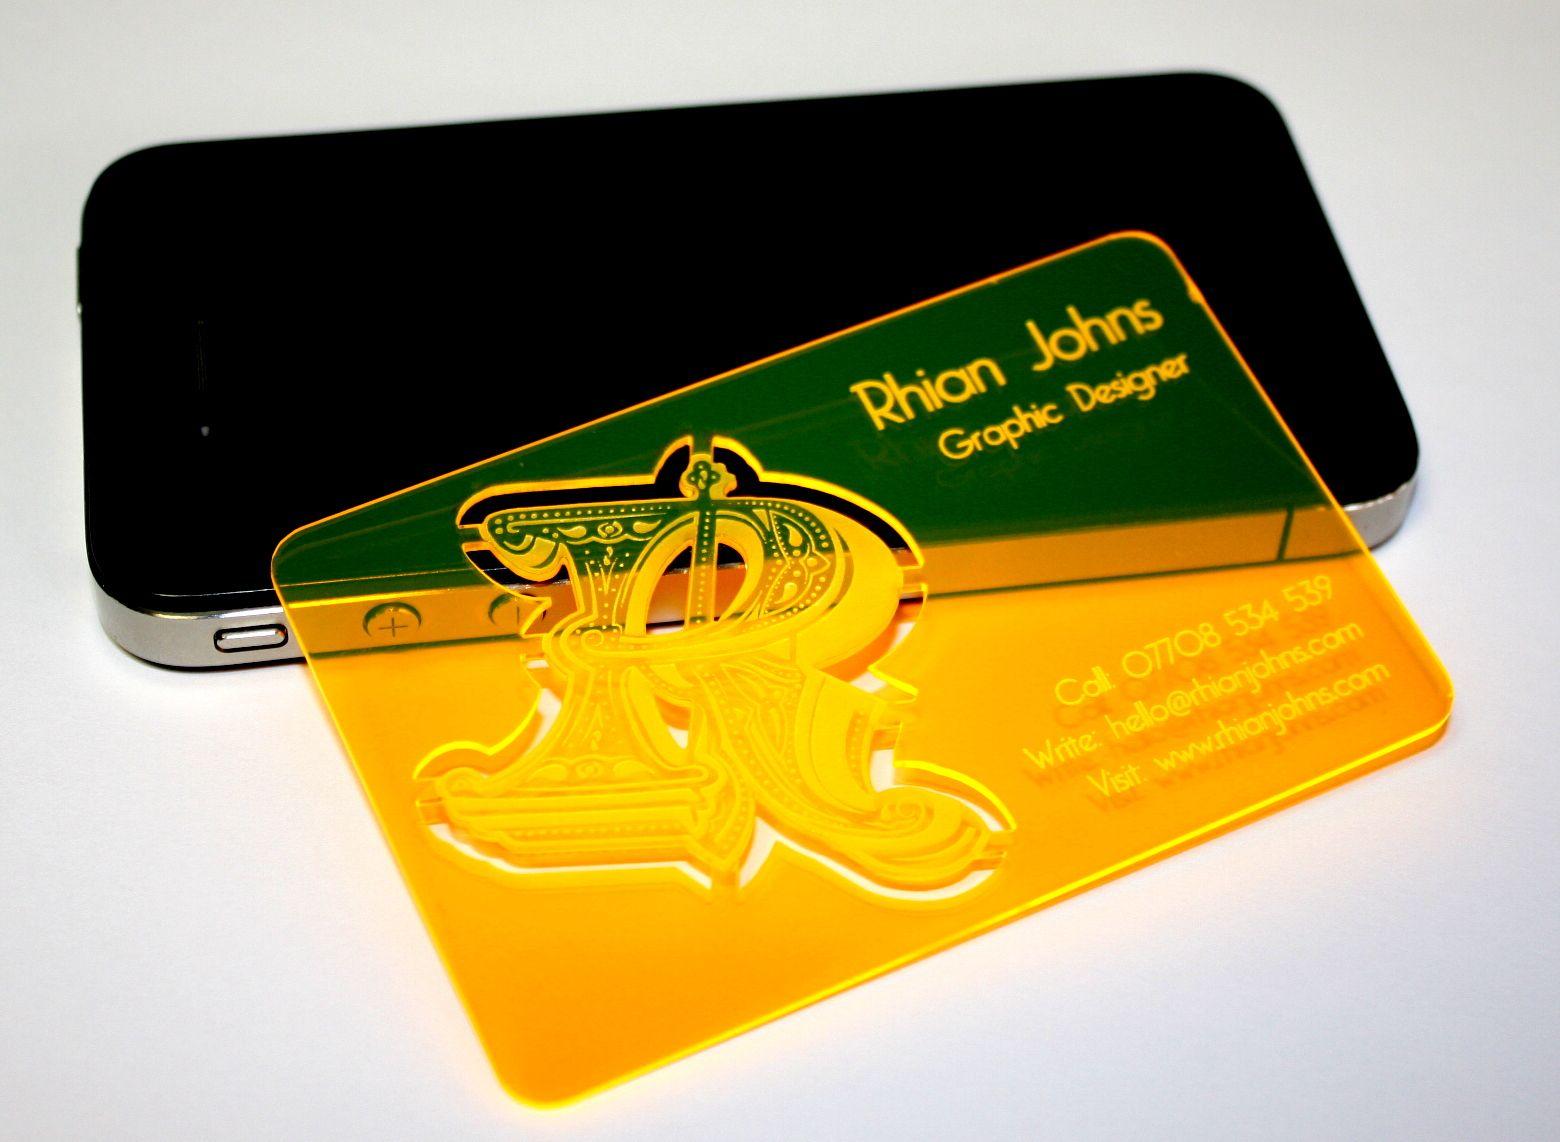 Acrylic business cards laser cut laser engraving thickness 1 mm acrylic business cards laser cut laser engraving thickness 1 mm a special thickness magicingreecefo Choice Image